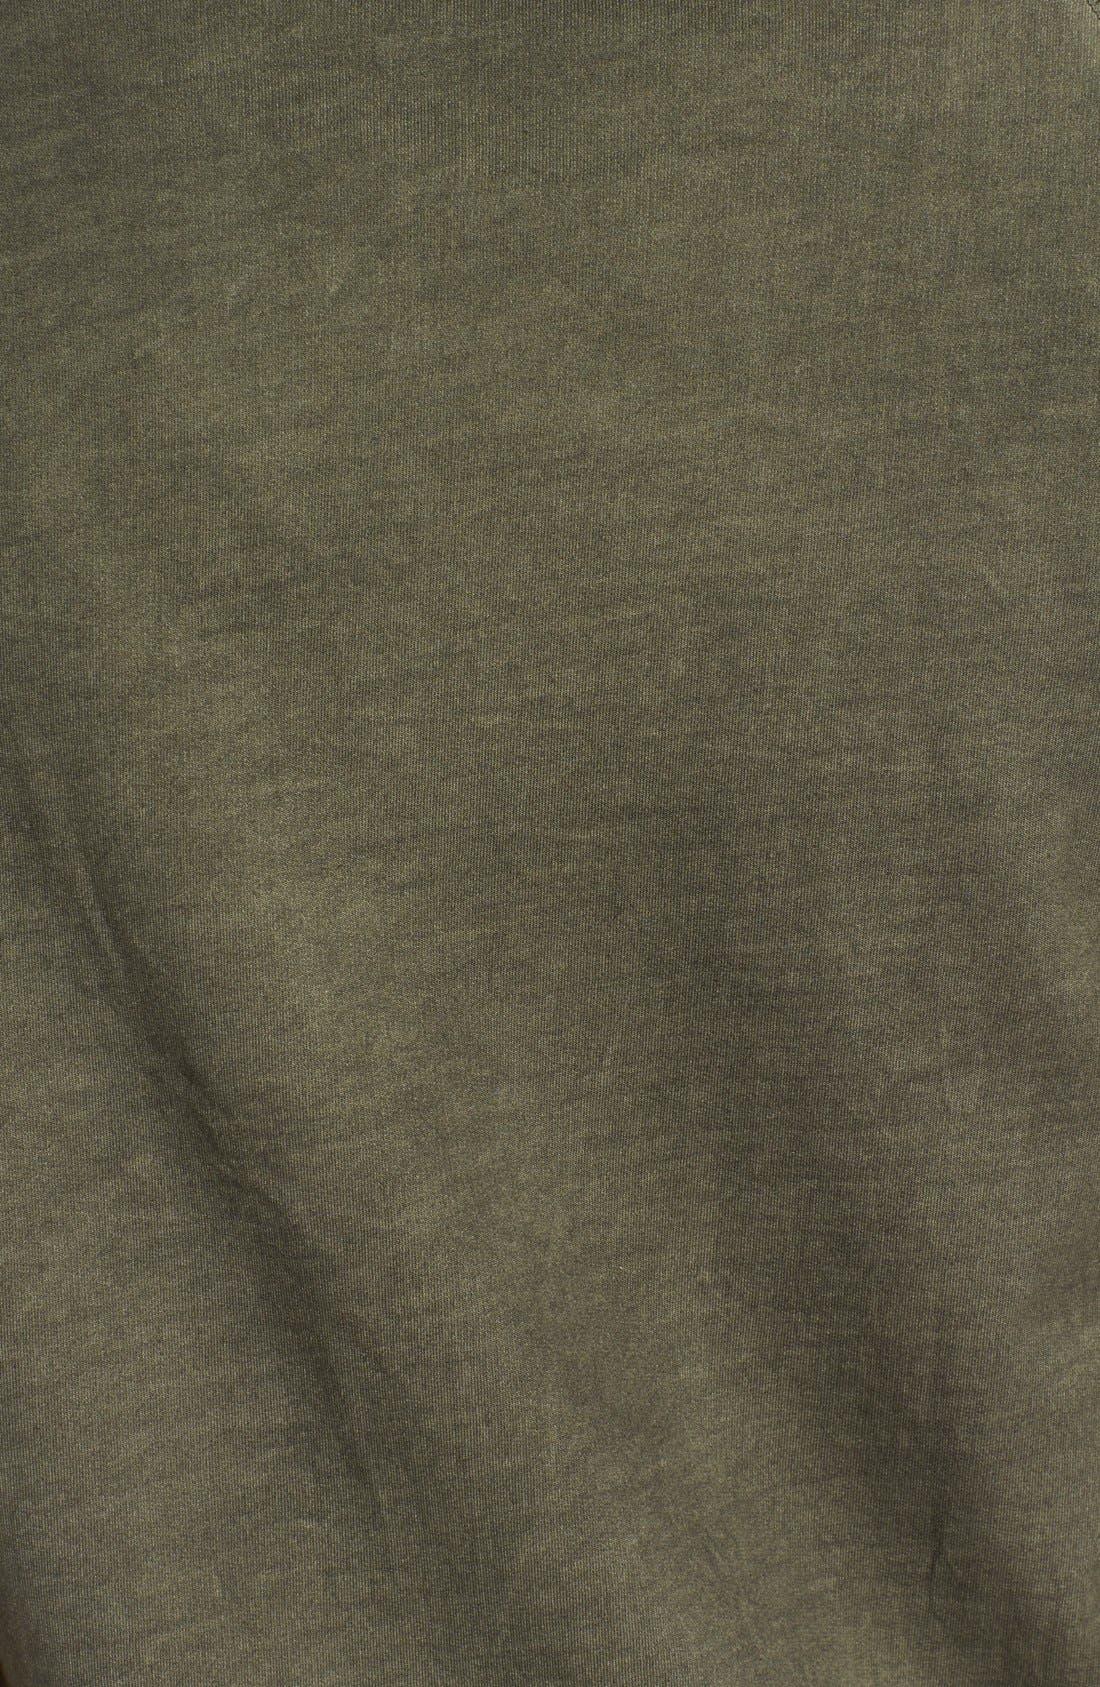 Raglan Sleeve T-Shirt,                             Alternate thumbnail 5, color,                             330